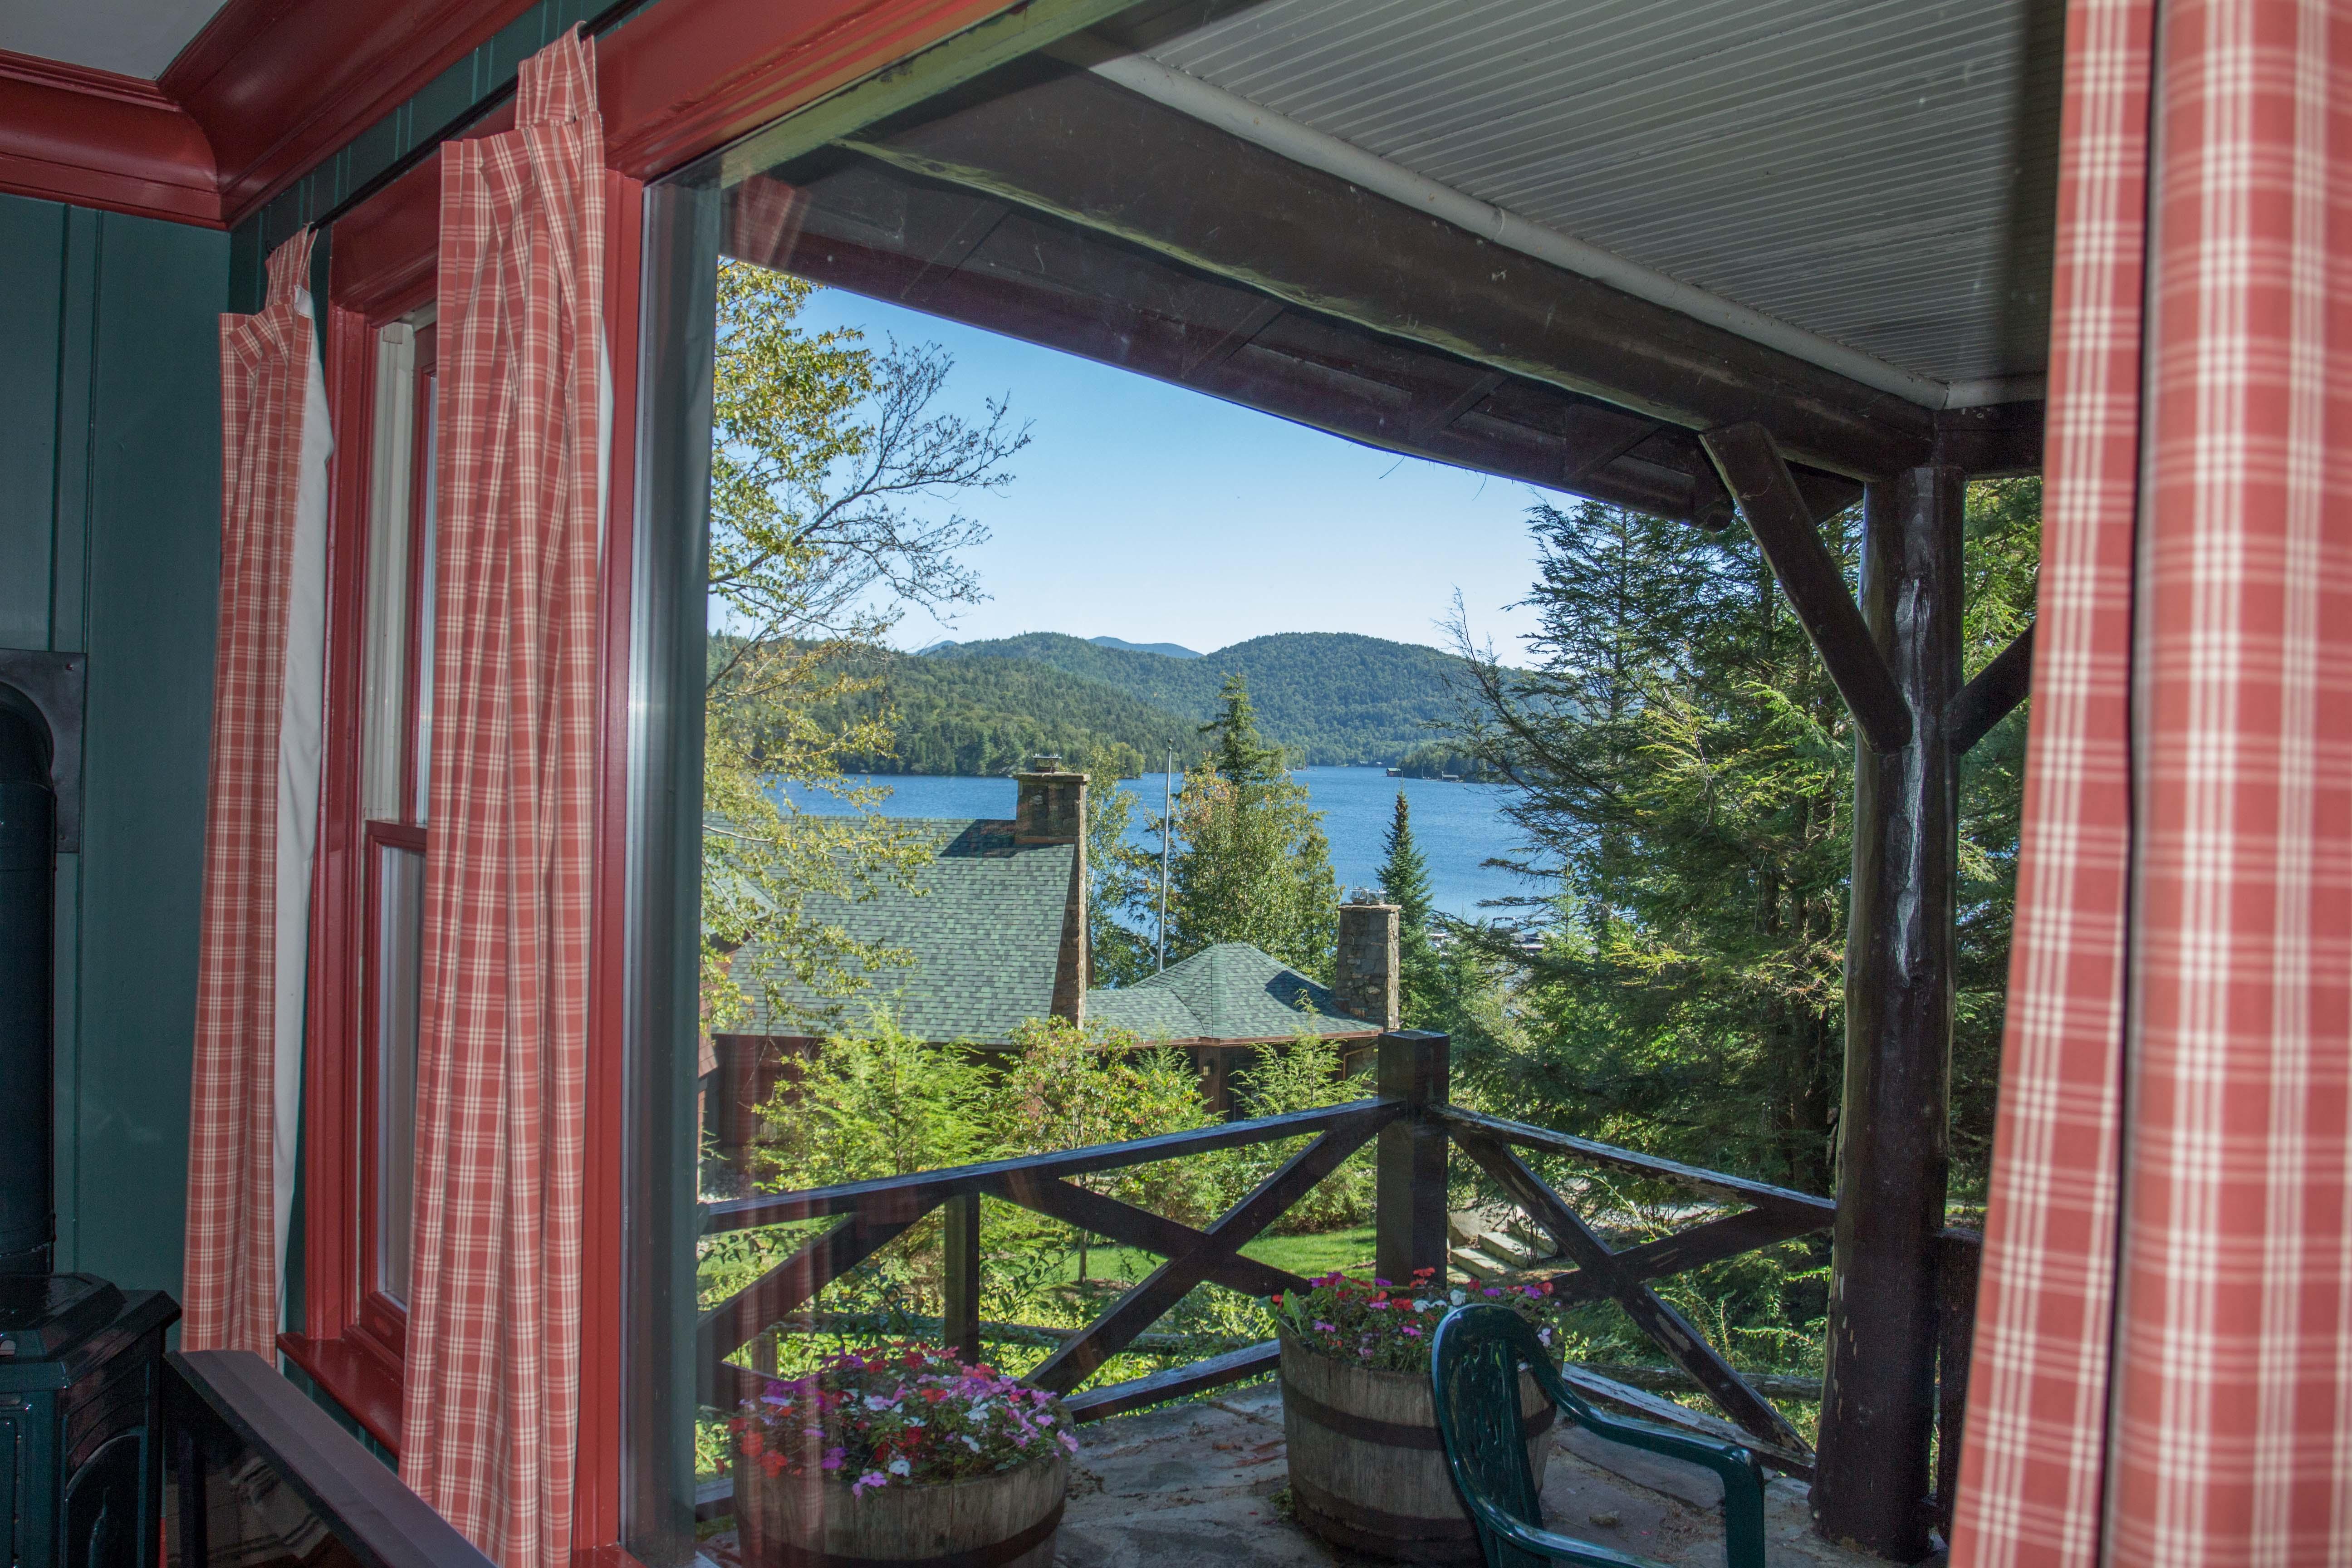 lakefront parks lake pulaski rentals cabins to cottage george own state ny for artt log livgsn rent in adirondacks rental cabin